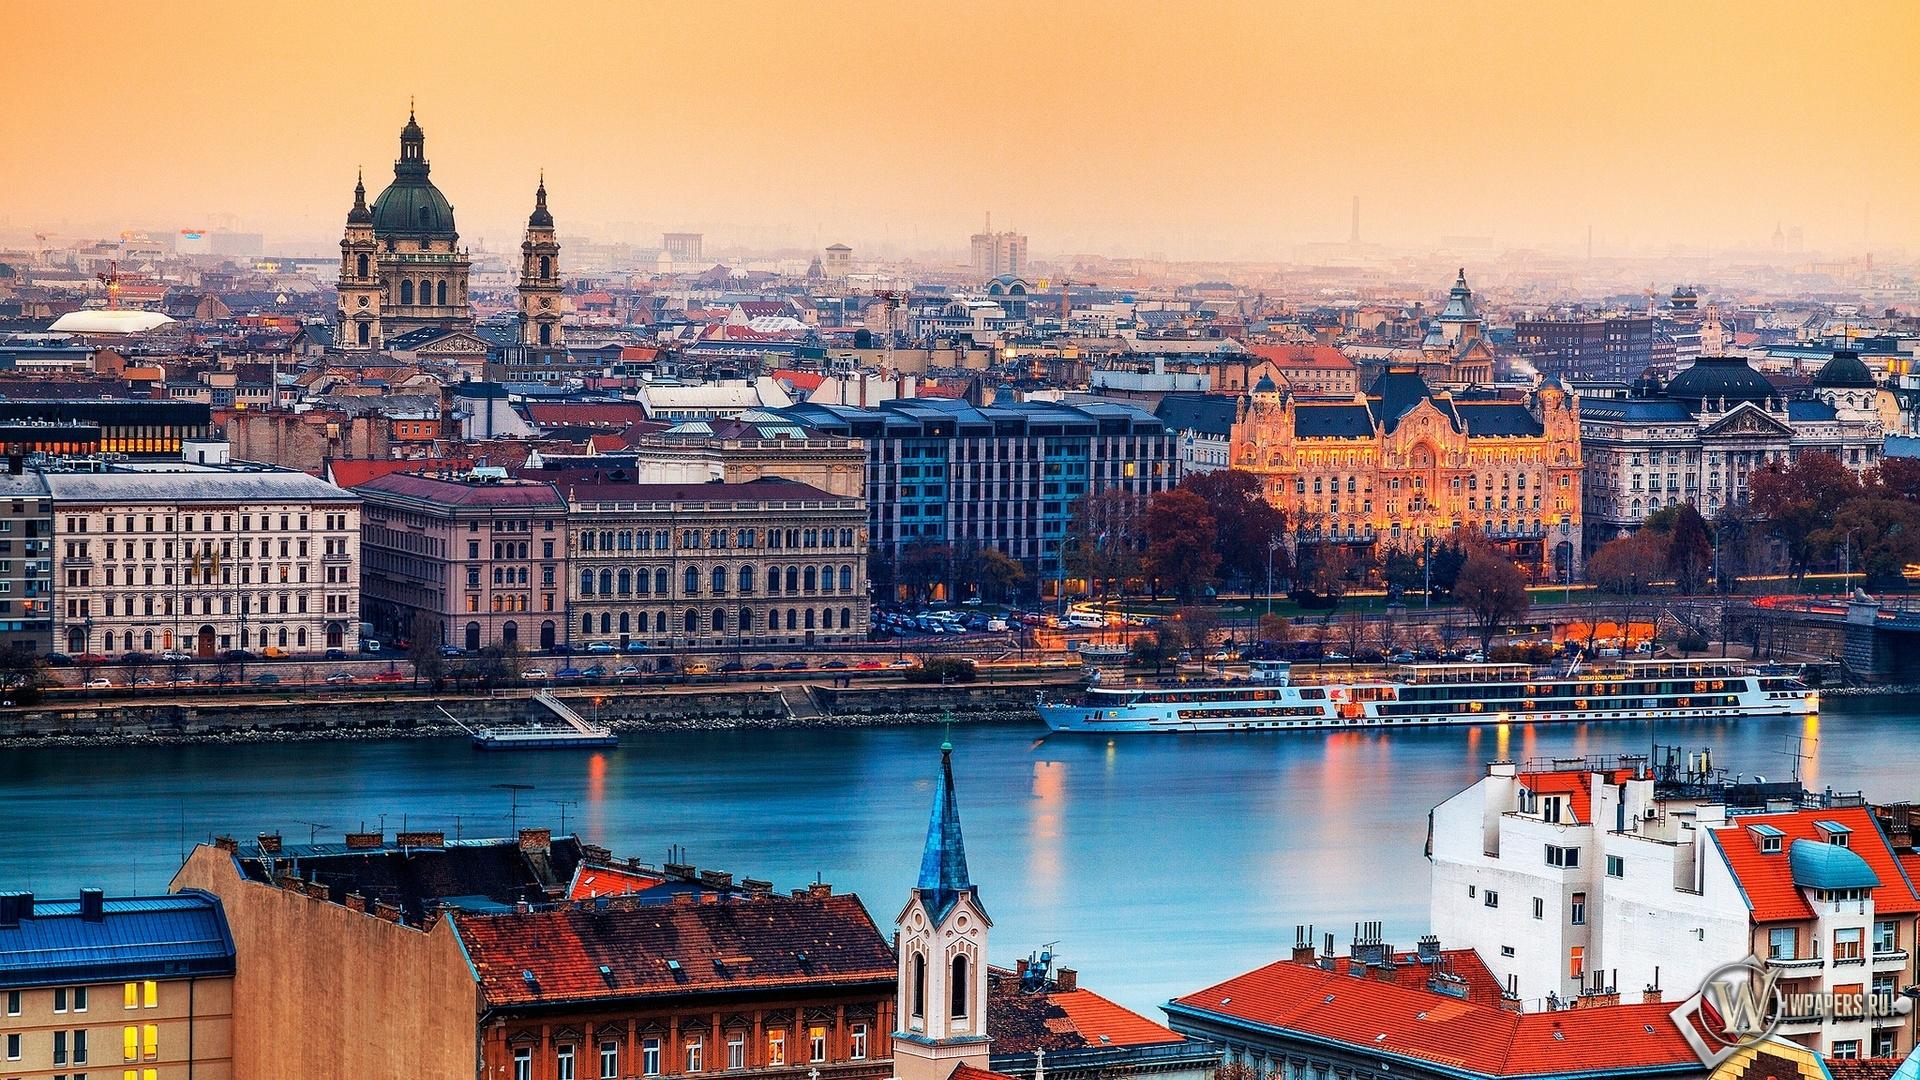 Будапешт 1920x1080